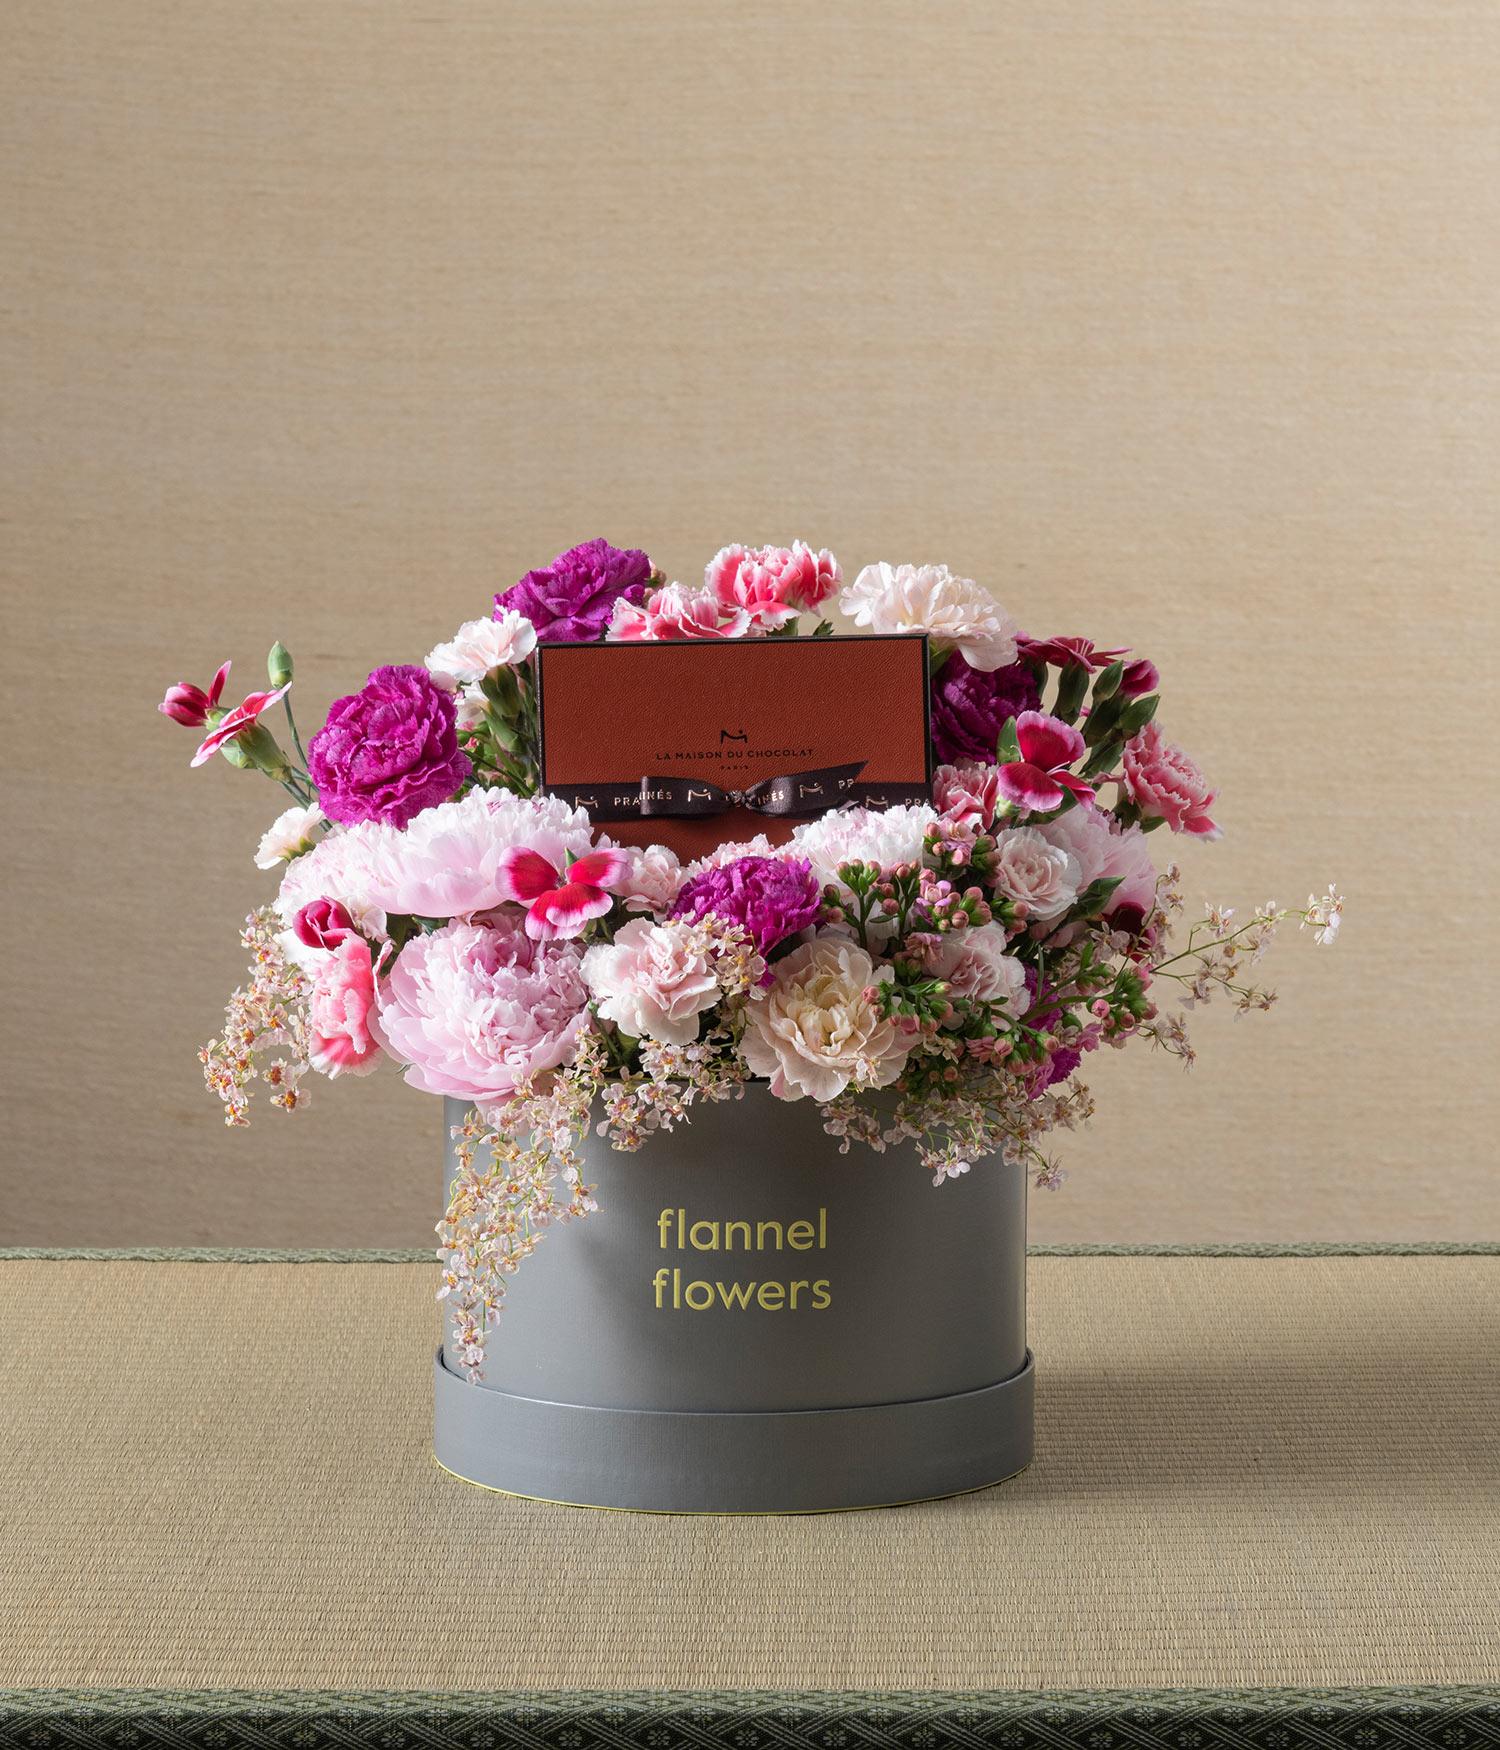 blossom II peony flower box by flannel flowers florist x Maison Du Chocolat